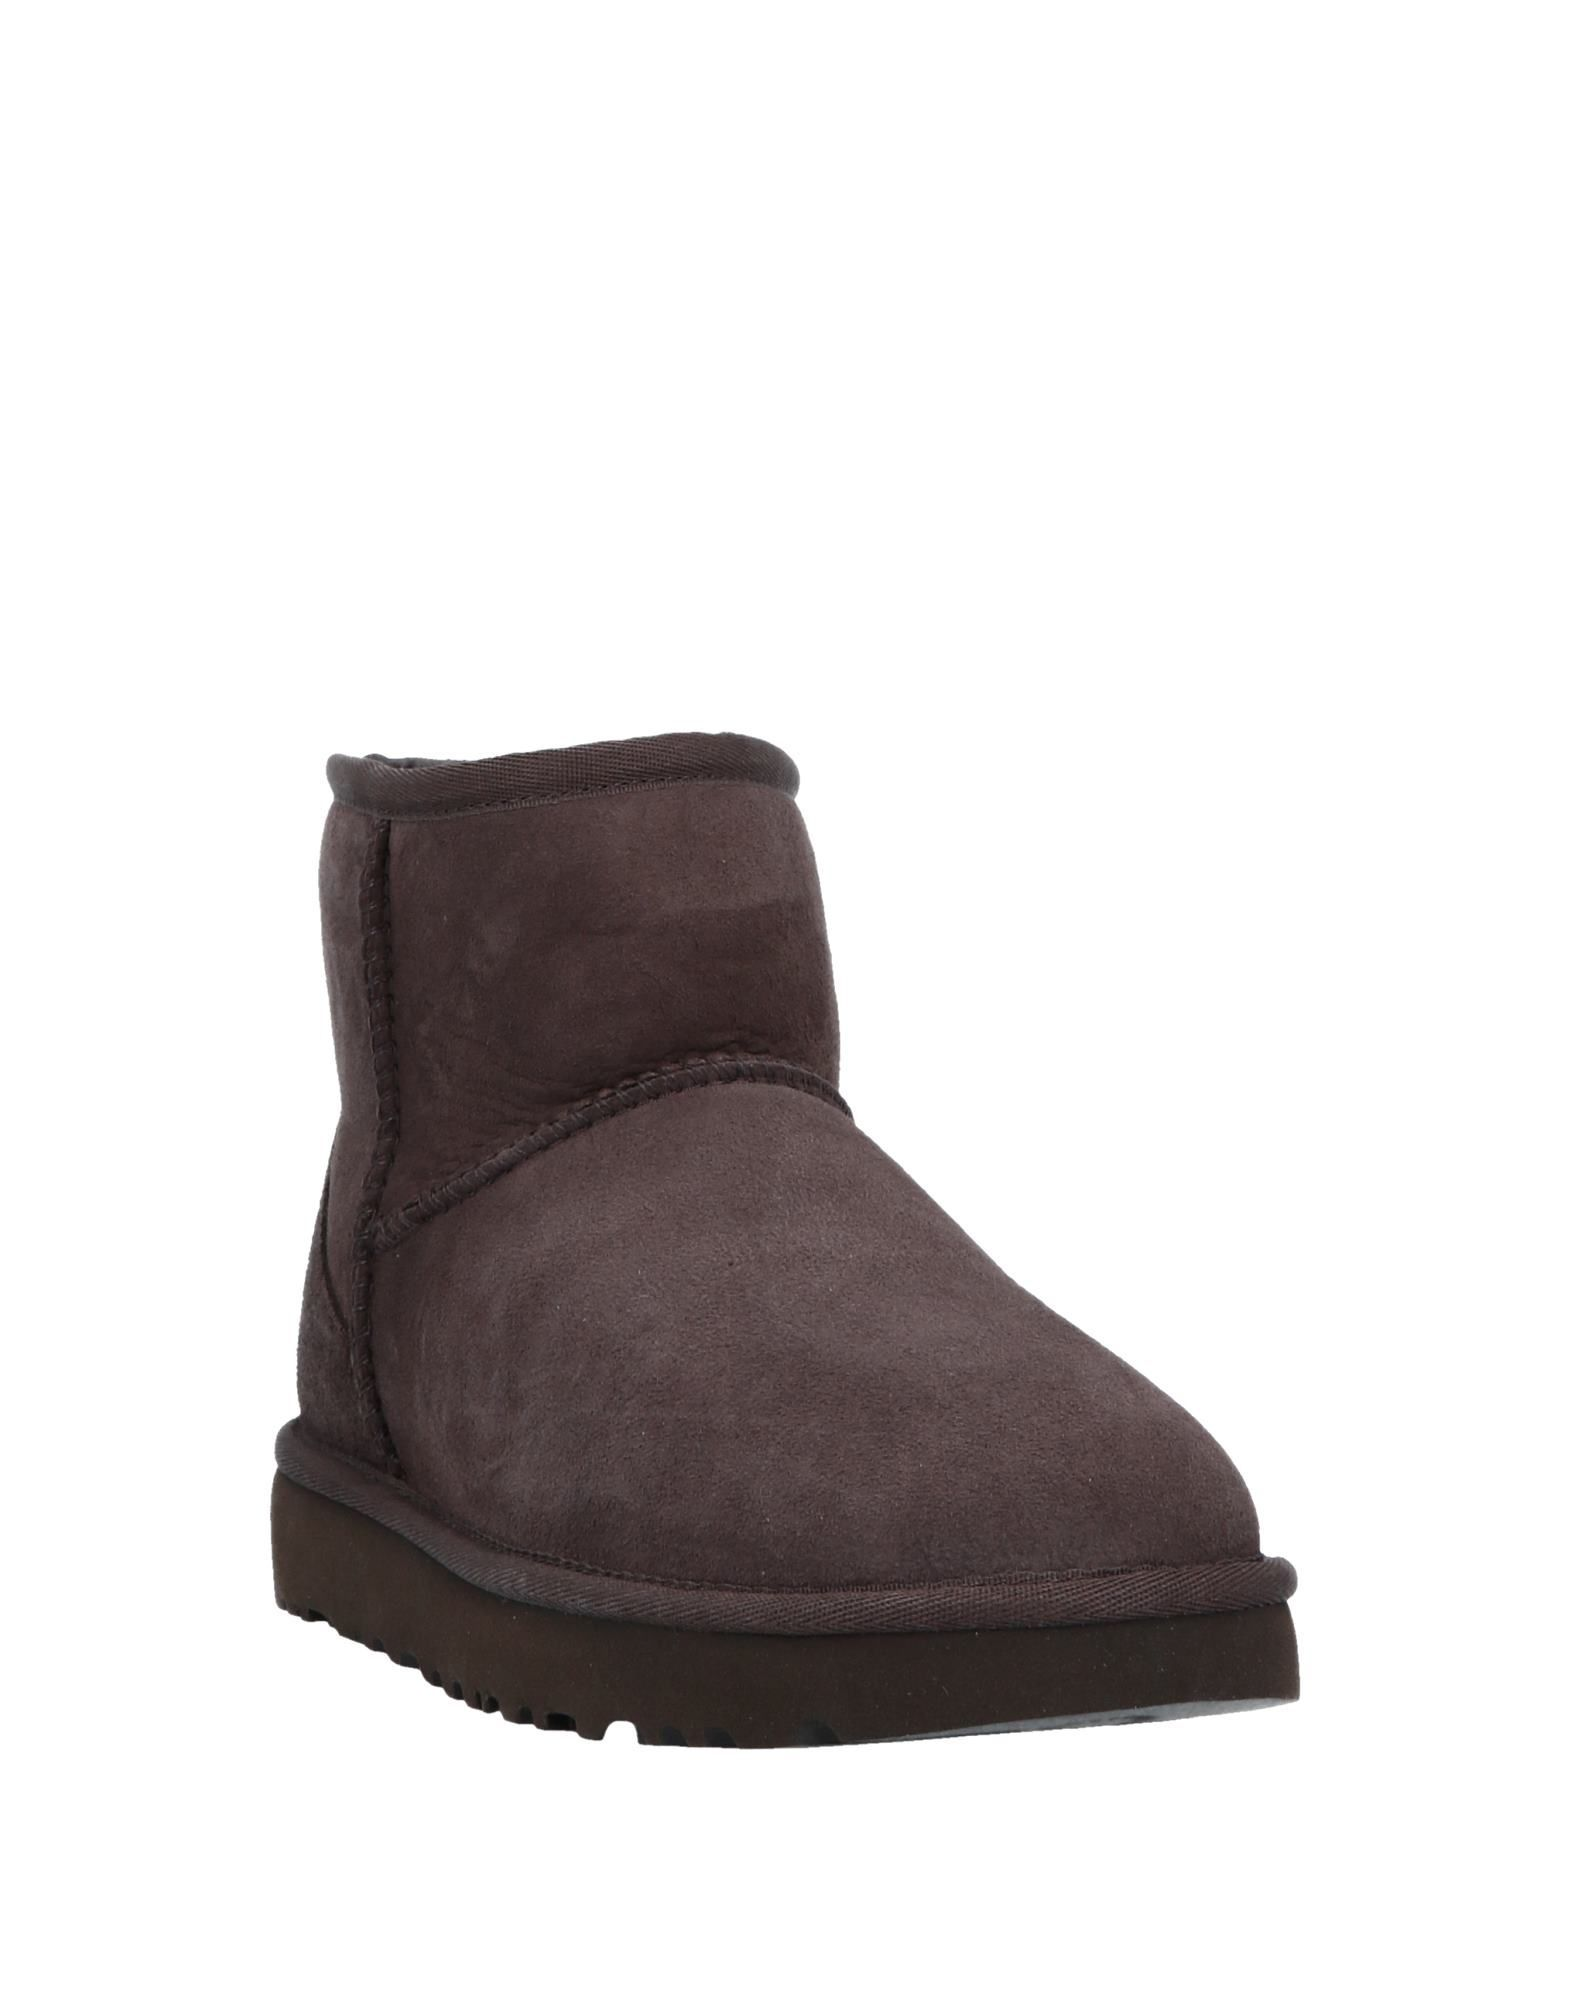 Ugg Australia Dark Brown Shearling Boots